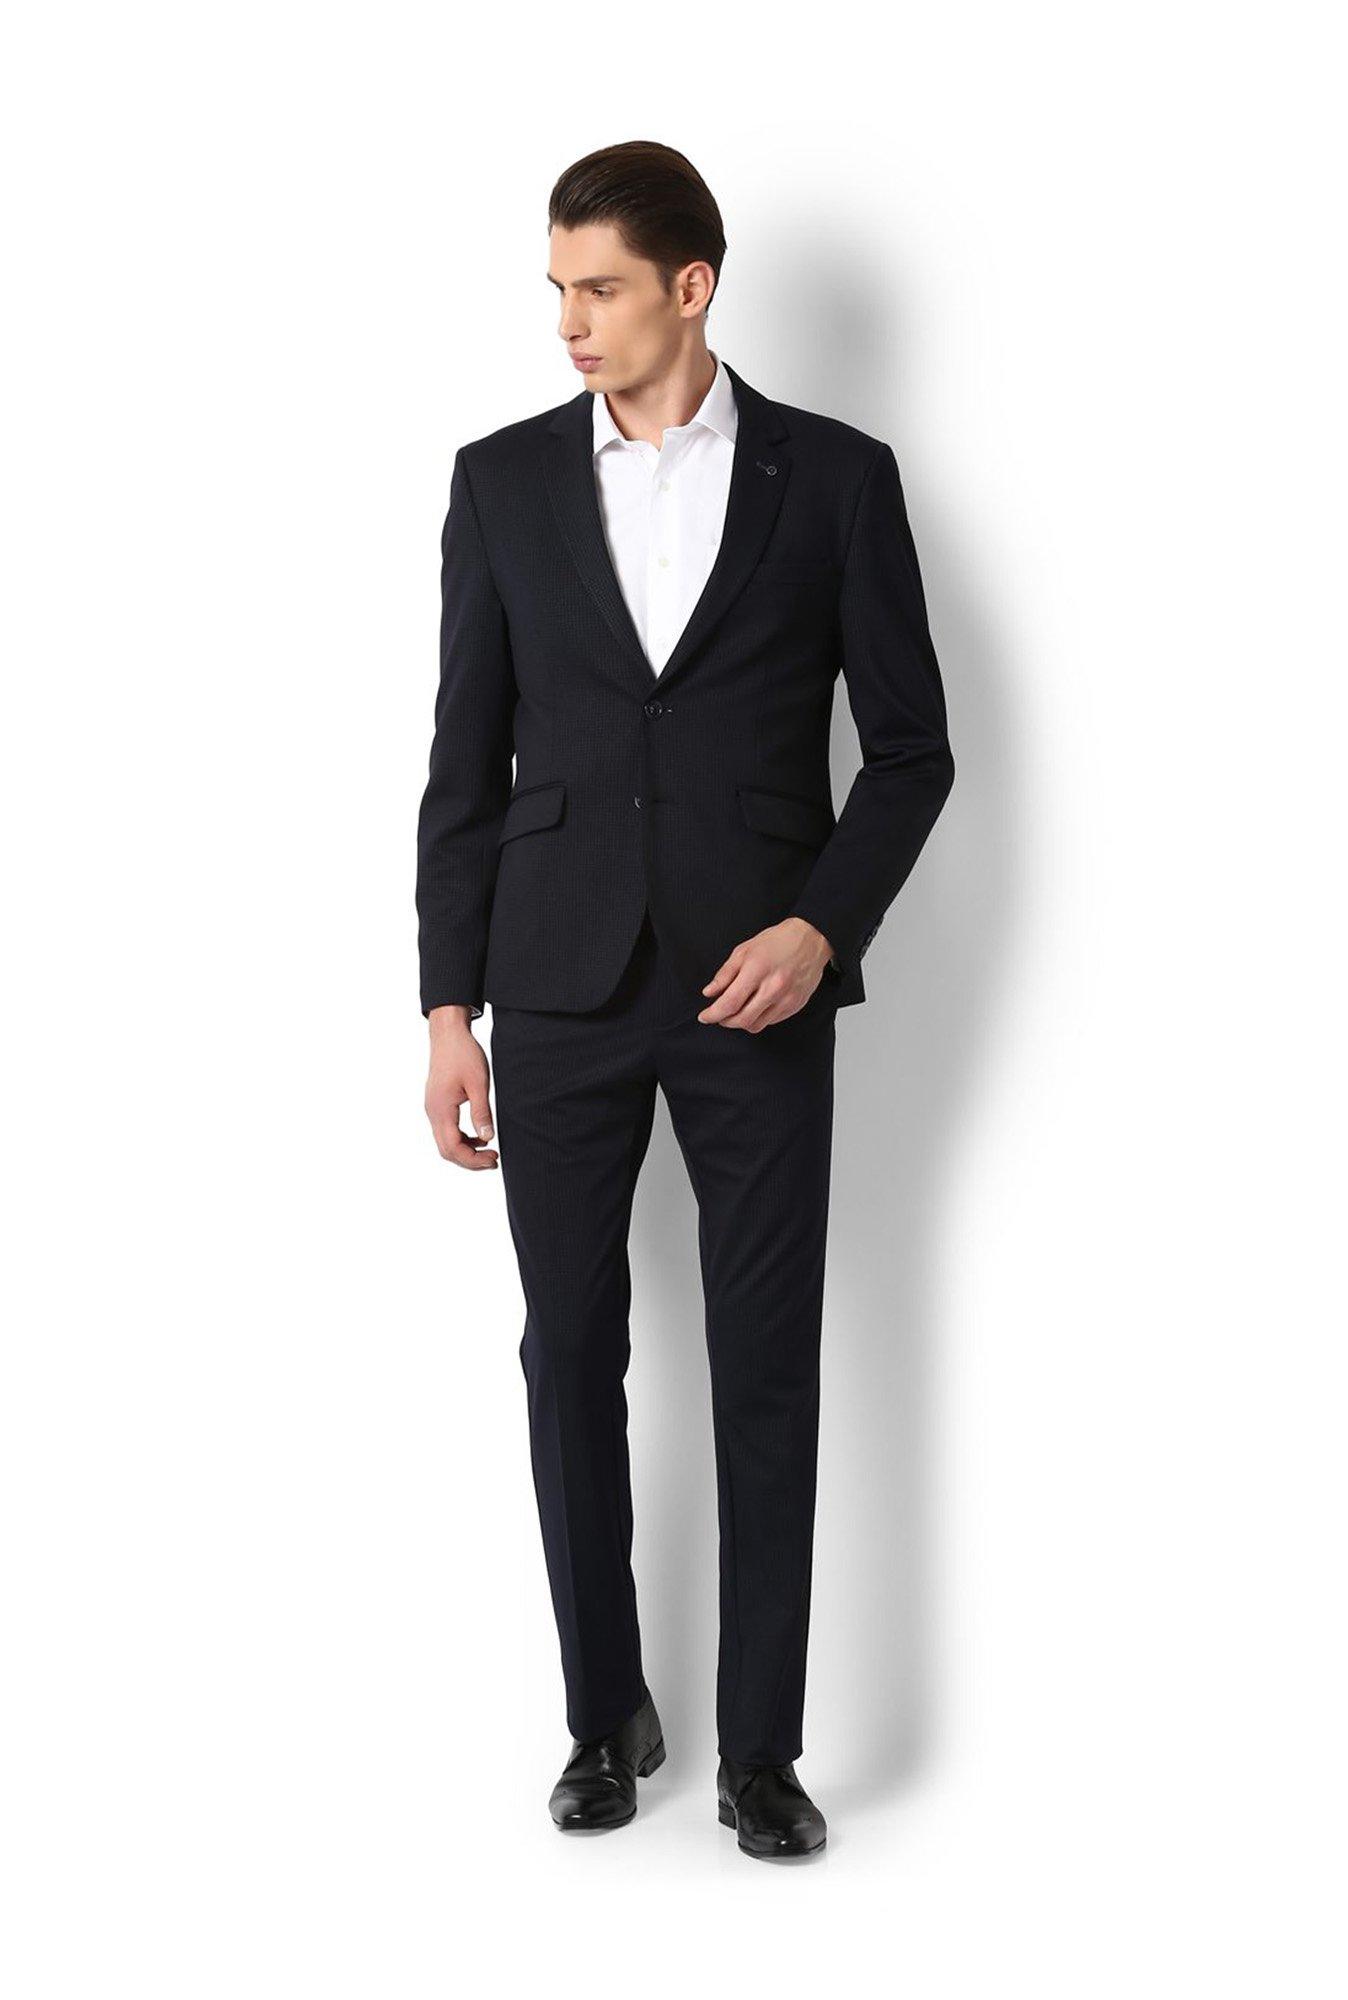 4ccac83461 Buy Van Heusen Black Flat Front Suit for Men Online   Tata CLiQ